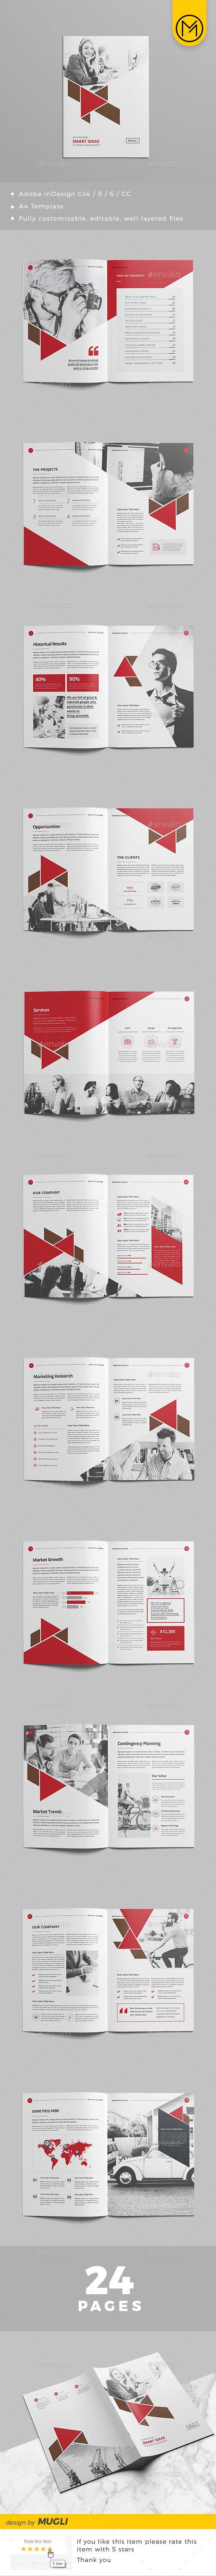 Brochure Design — InDesign INDD #clean proposal #proposal web • Download ➝ https://graphicriver.net/item/brochure-design/21203614?ref=pxcr